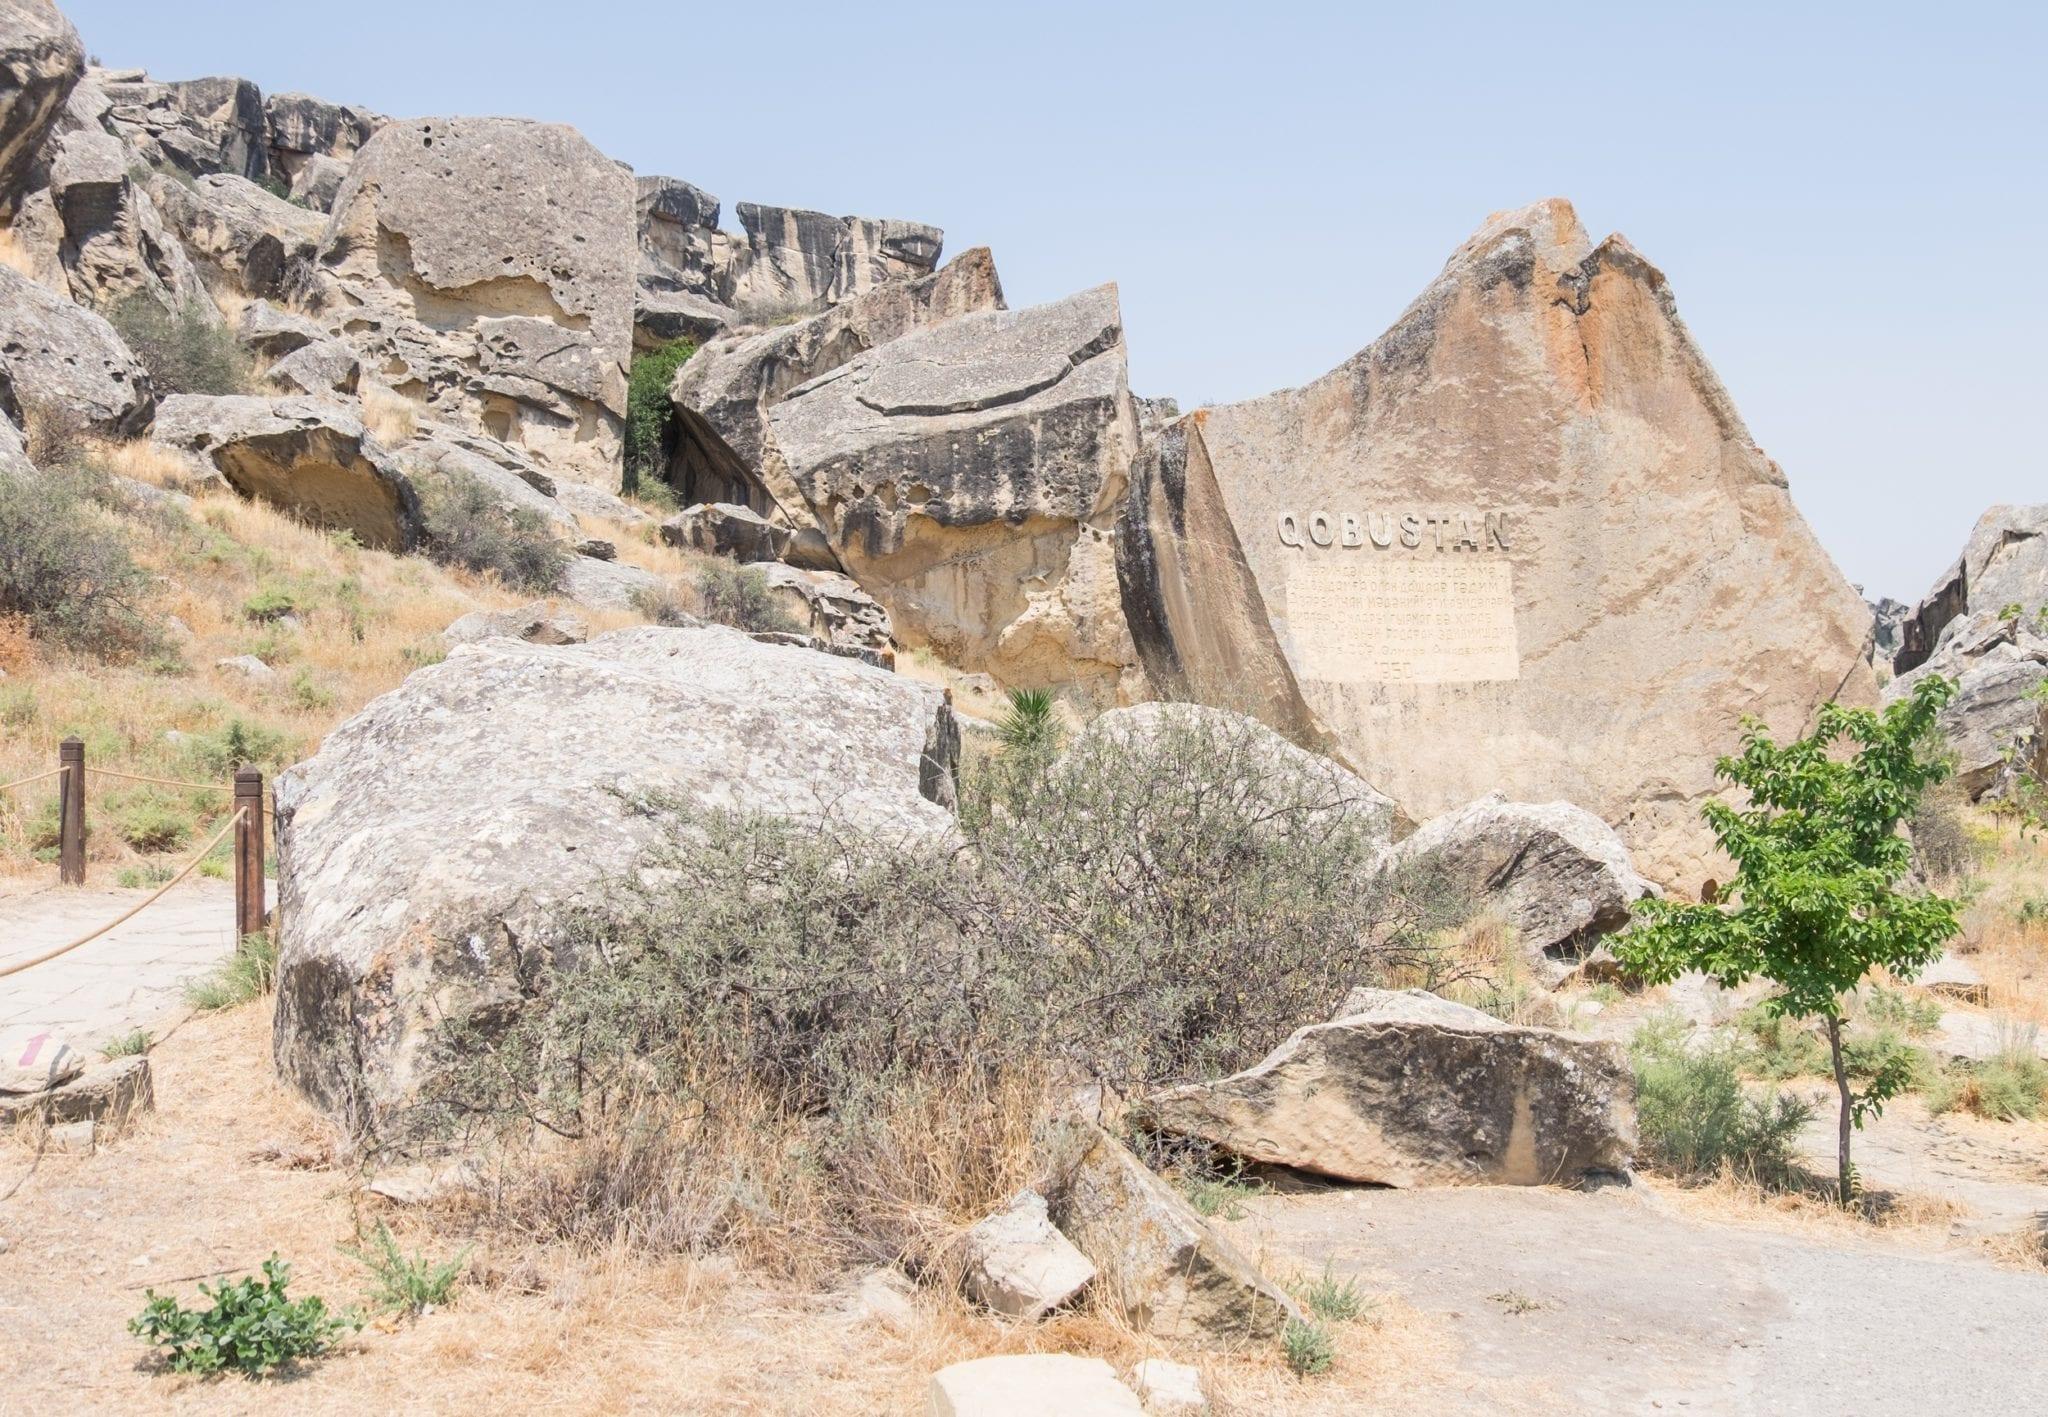 The rocky entrance to the Qobustan petroglyphs.